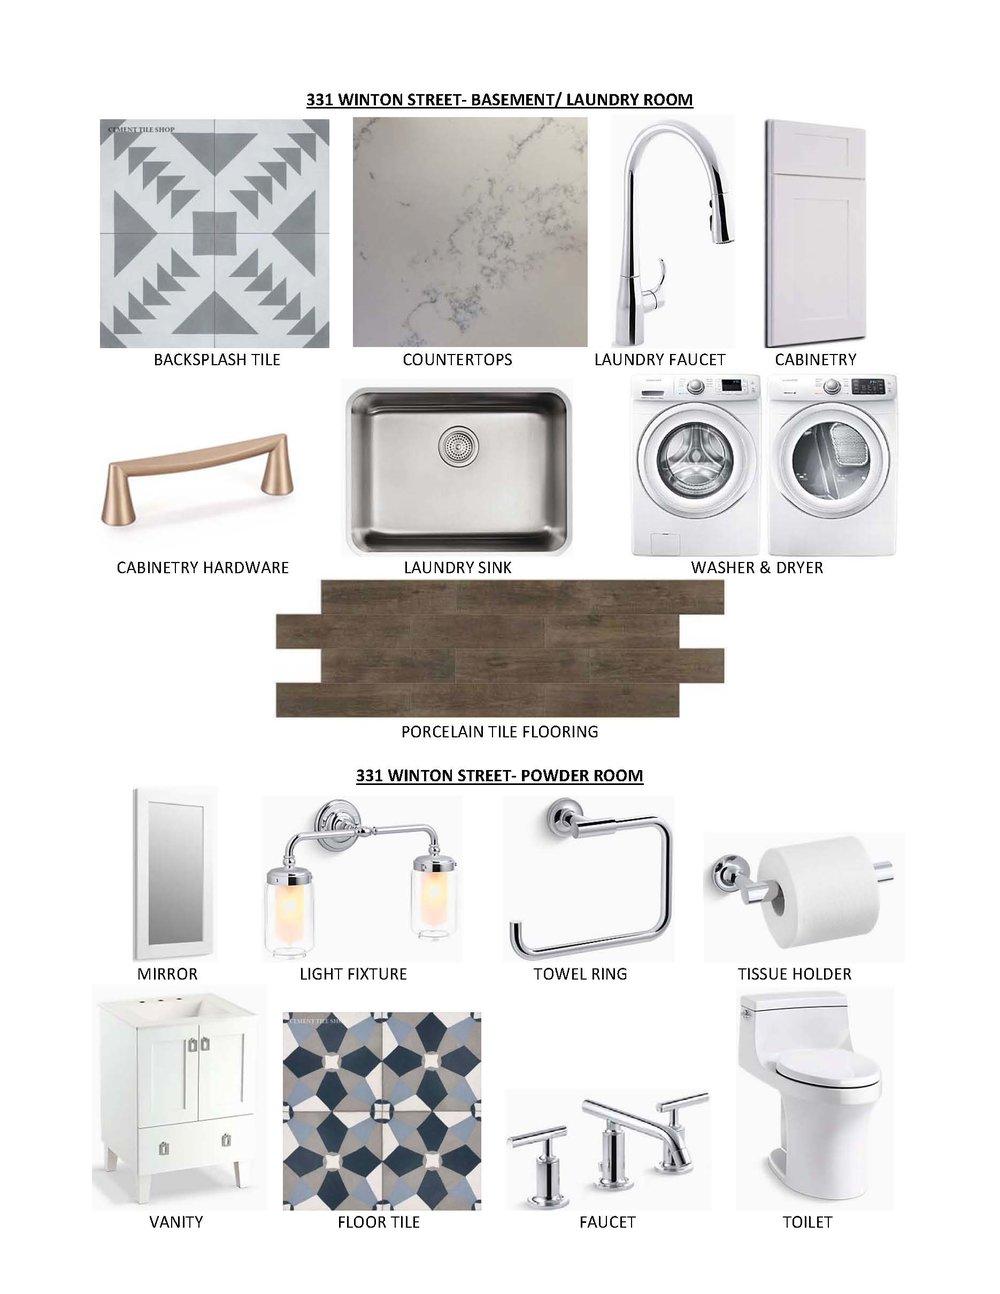 basement & laundry.jpg